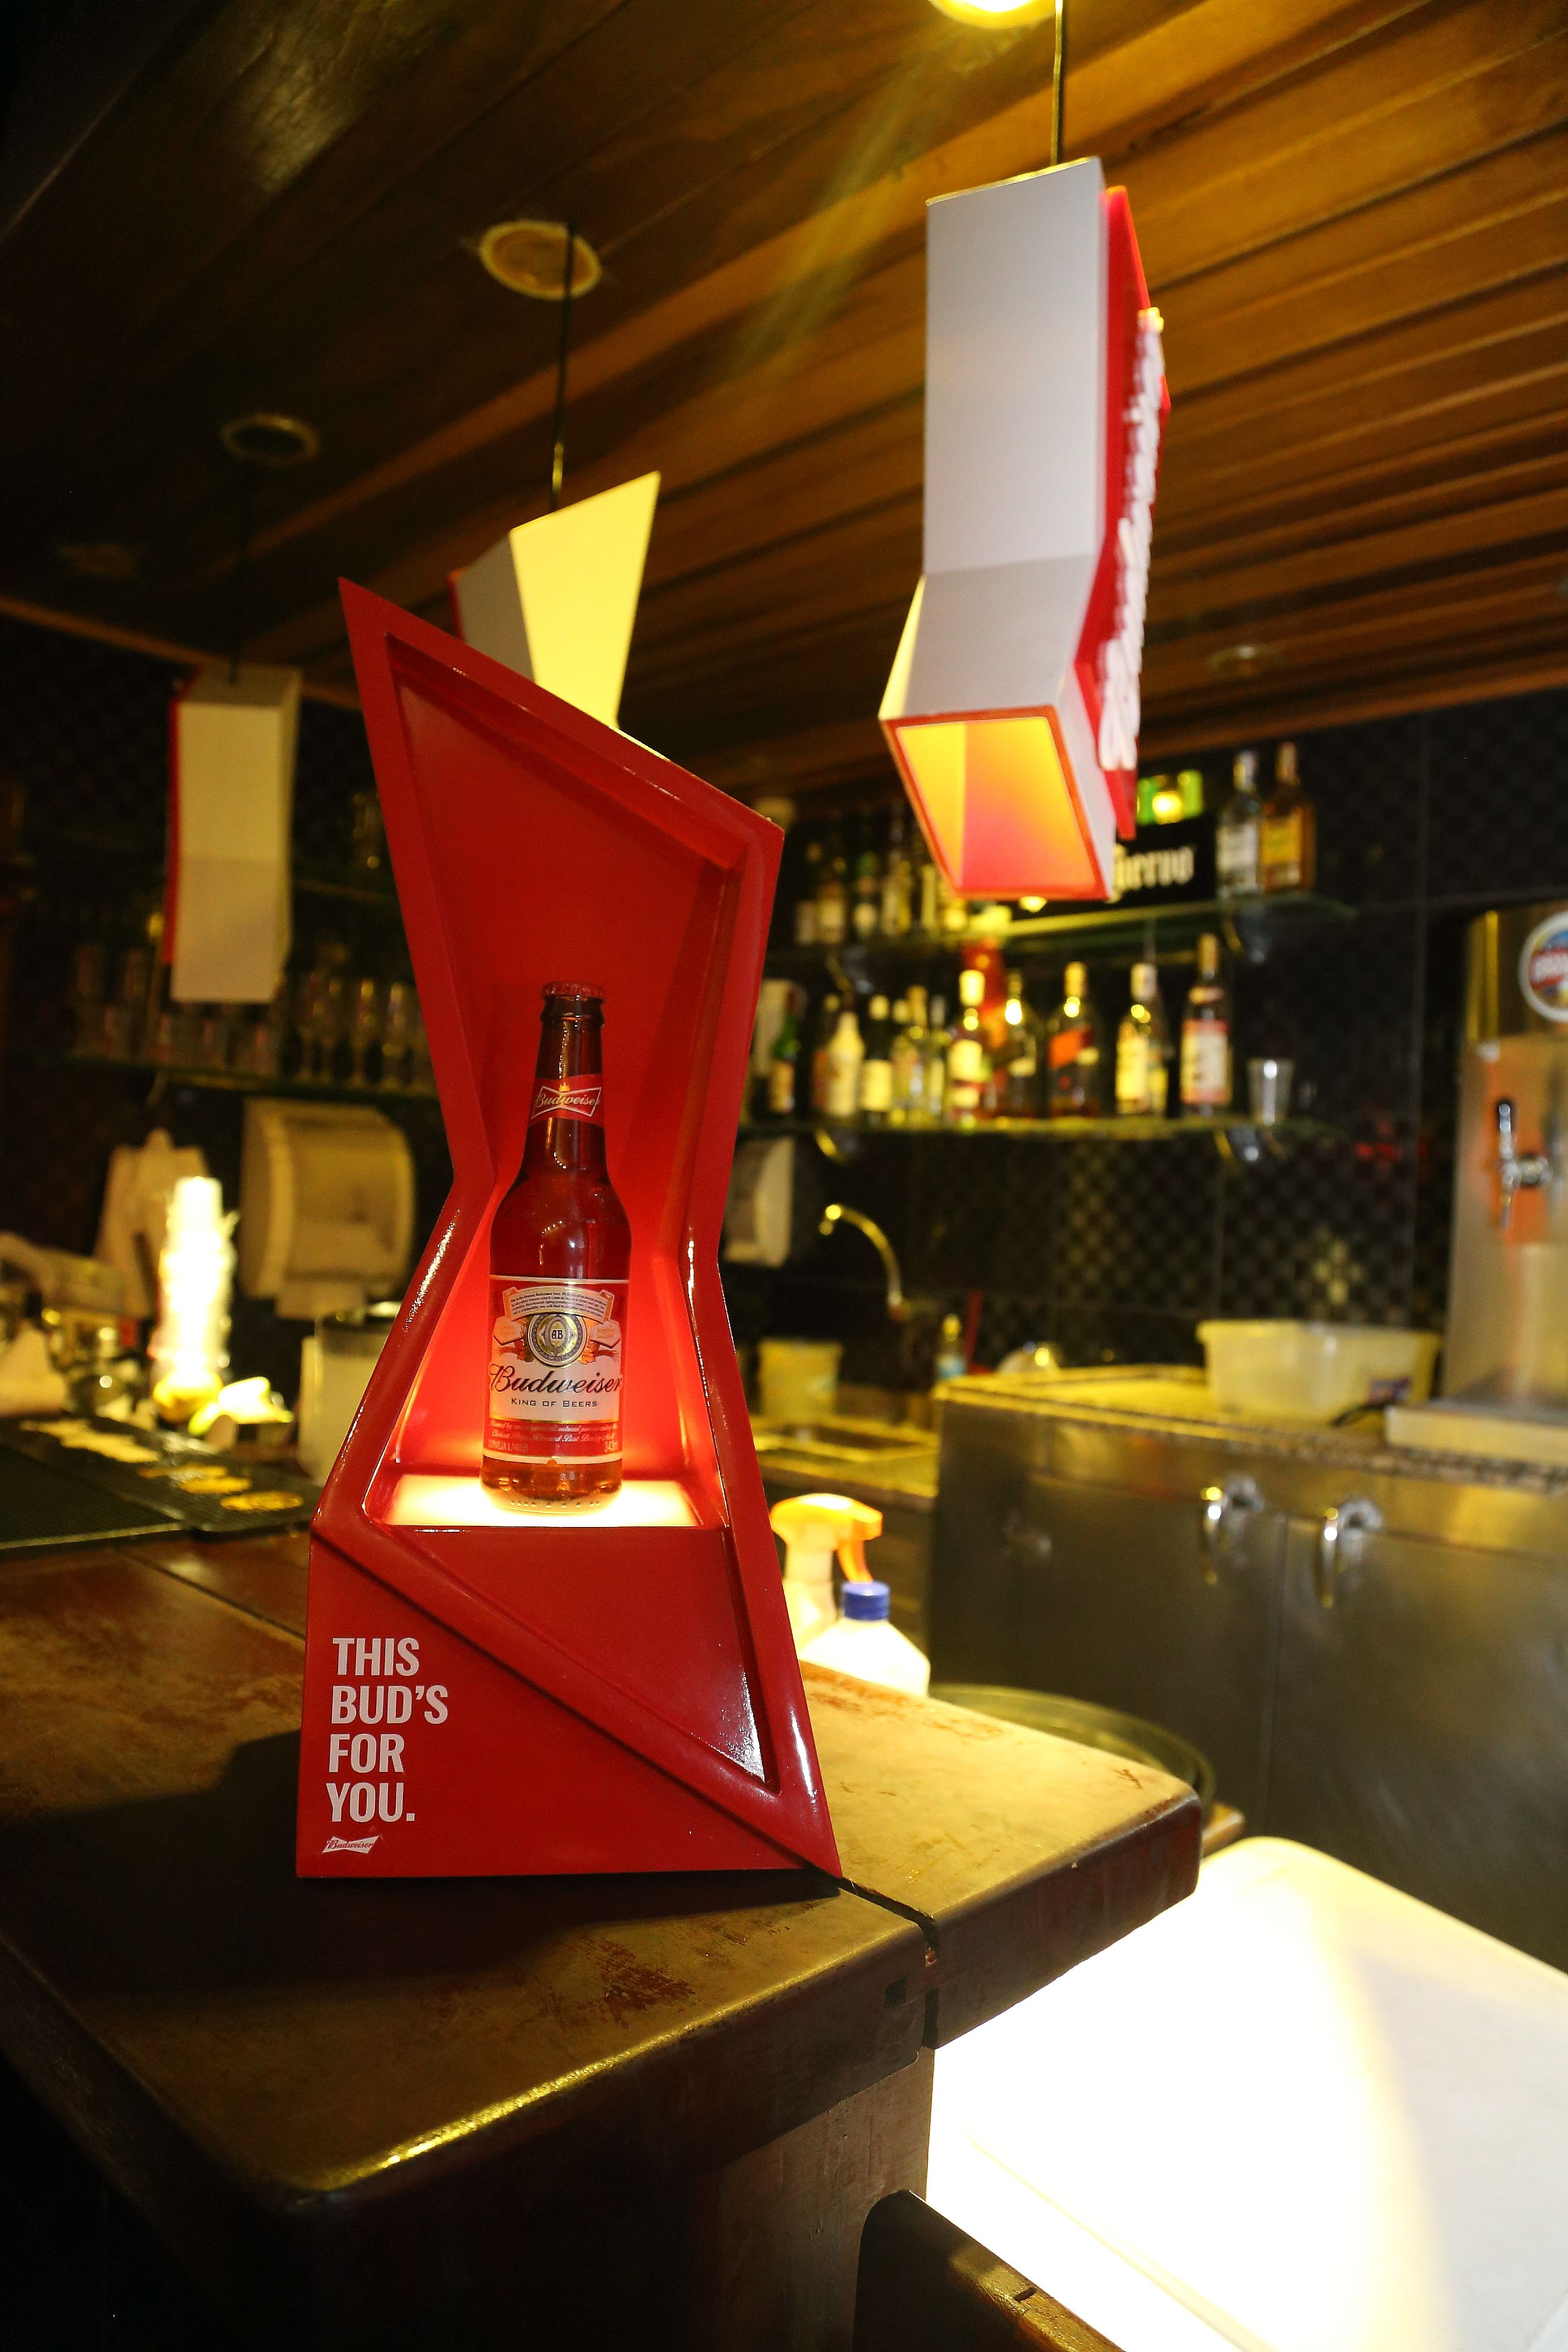 O Bar Da Eva Localizado No Rio De Janeiro Recebeu Pecas Do Tailor Made Da Budweiser Desenvolvido Pela Agencia Ioio Con Imagenes Disenos De Unas Punto De Venta Exhibidor